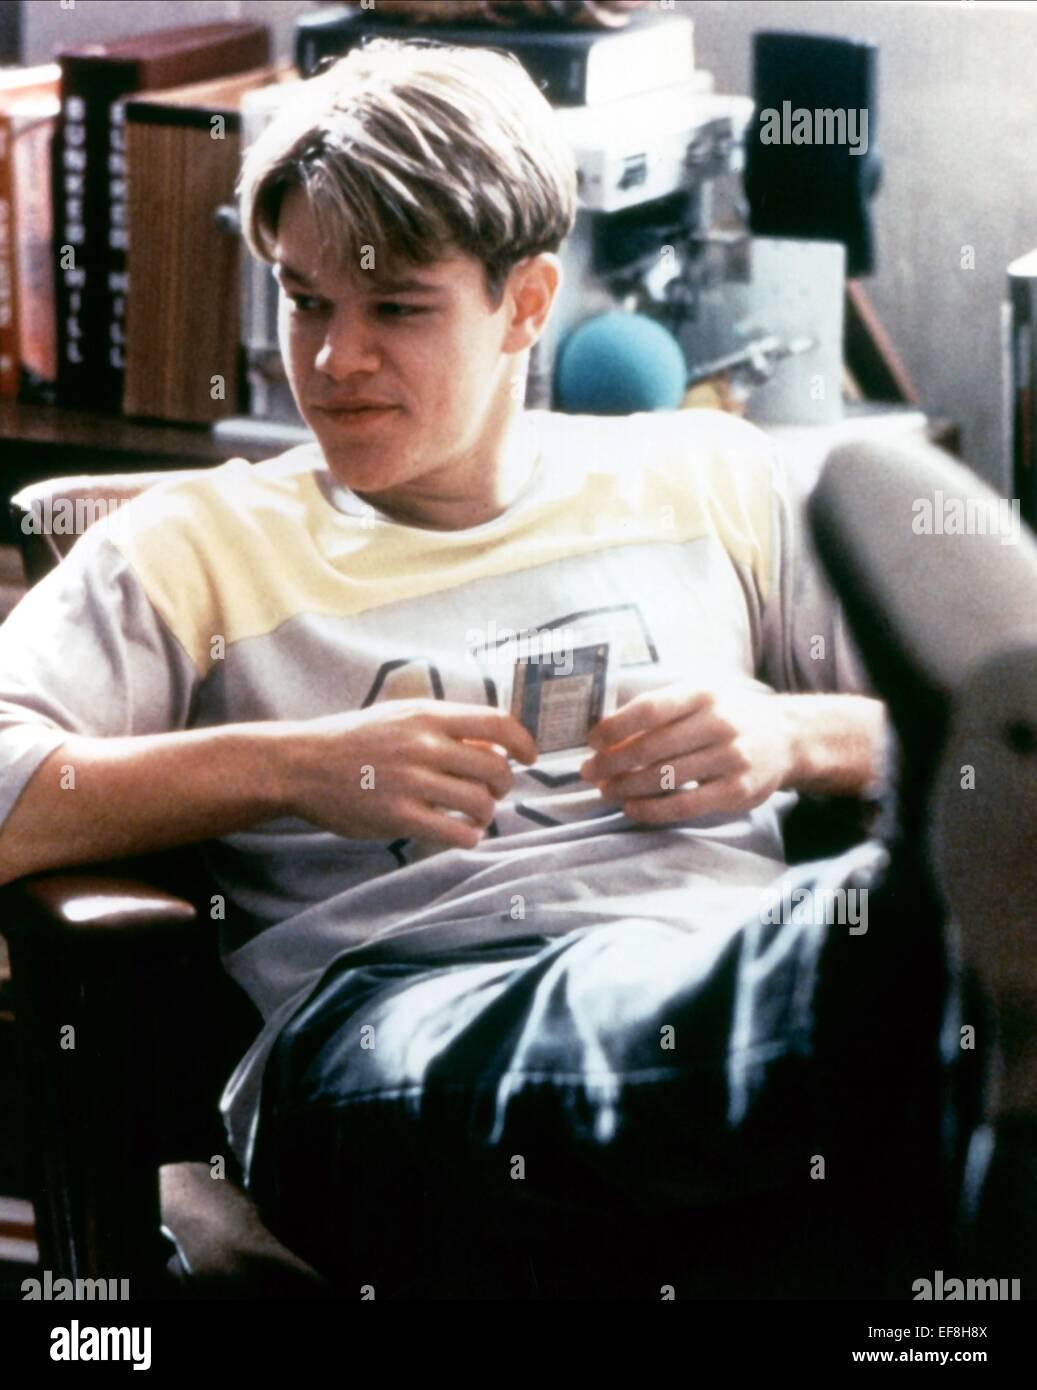 Matt Damon Good Will Hunting 1997 Stock Photo Alamy